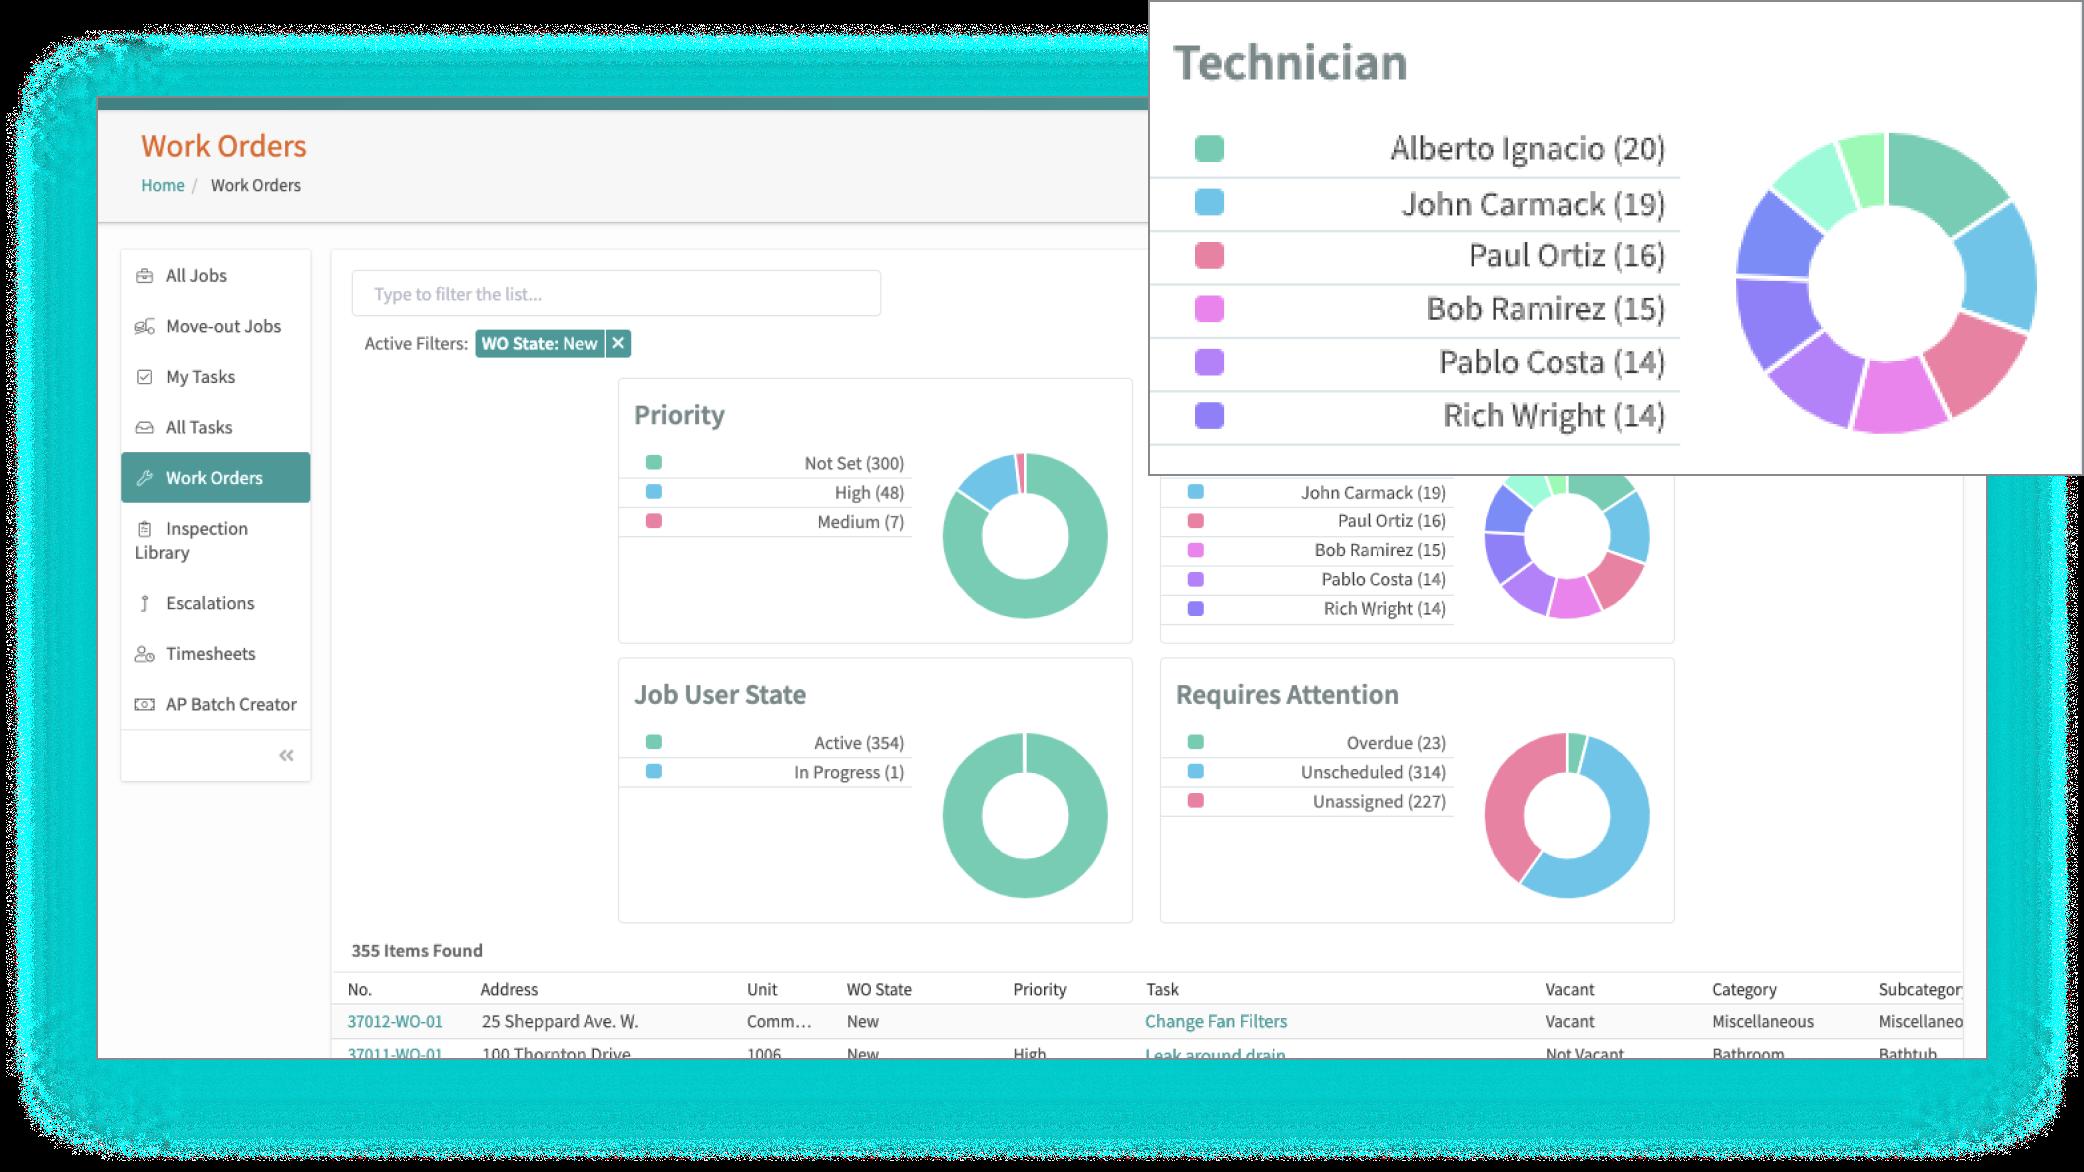 Desktop - work order dashboard highlighting technicians